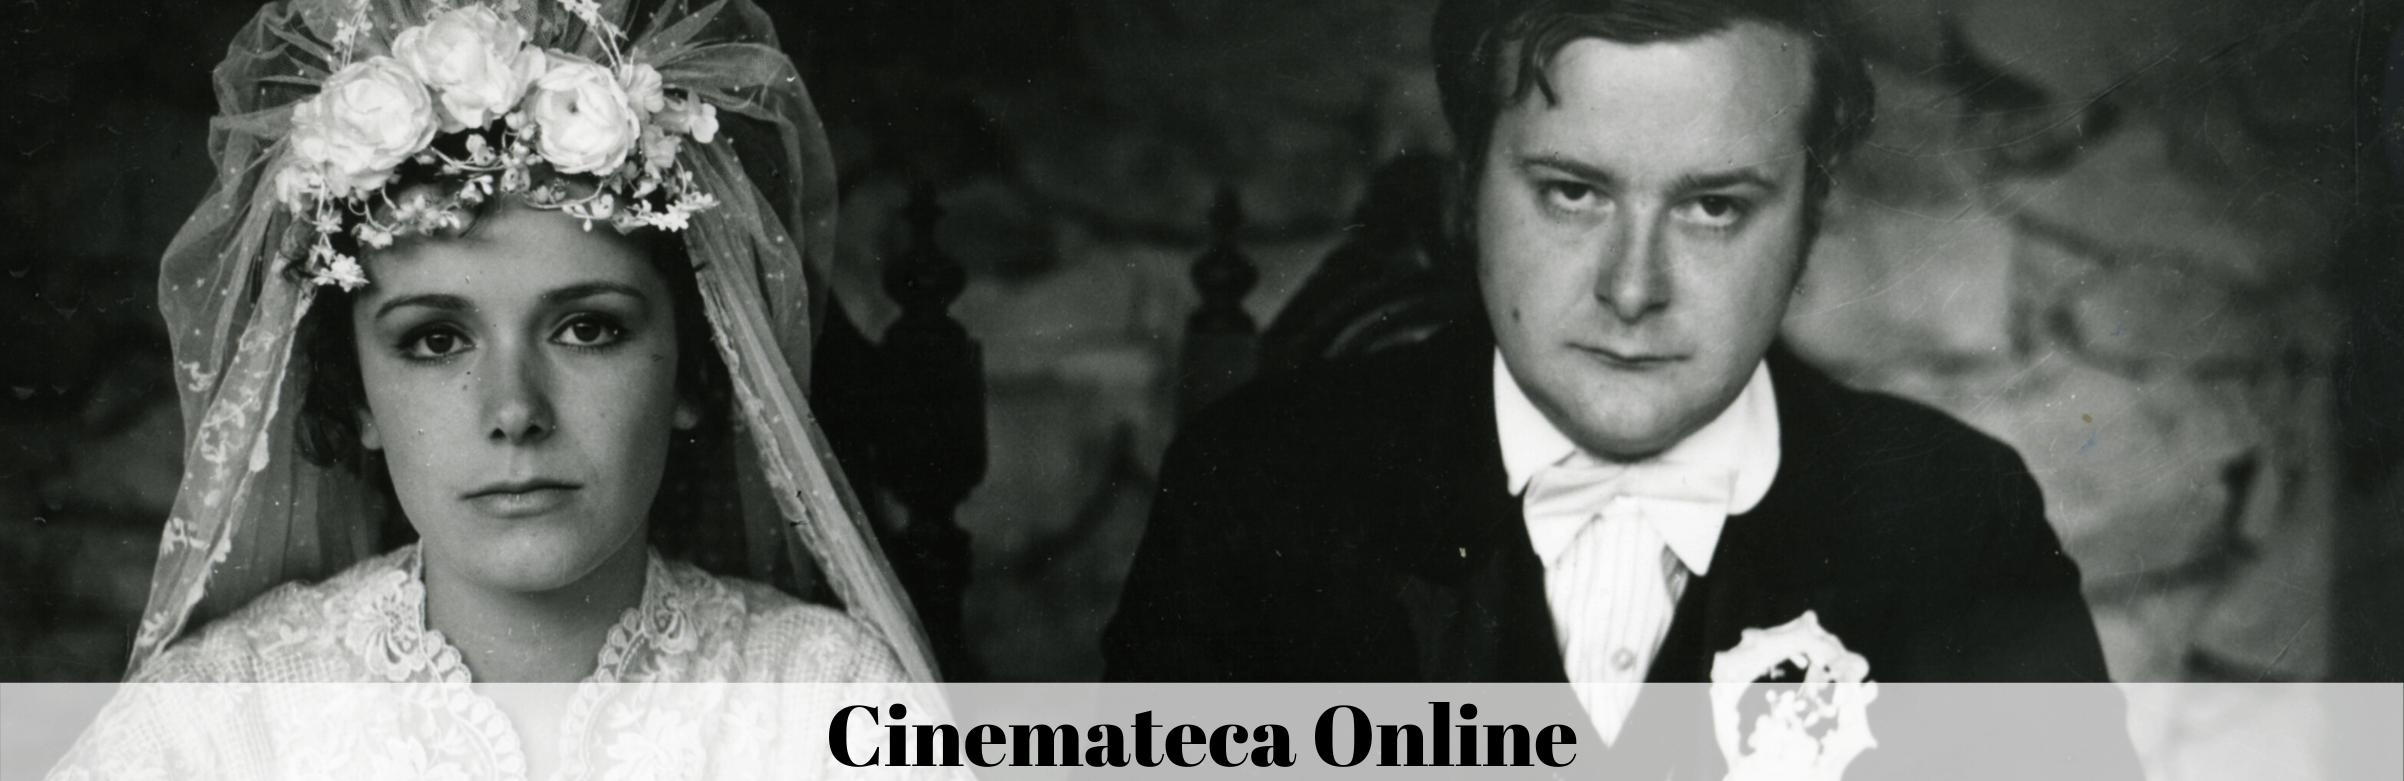 cinemateca online